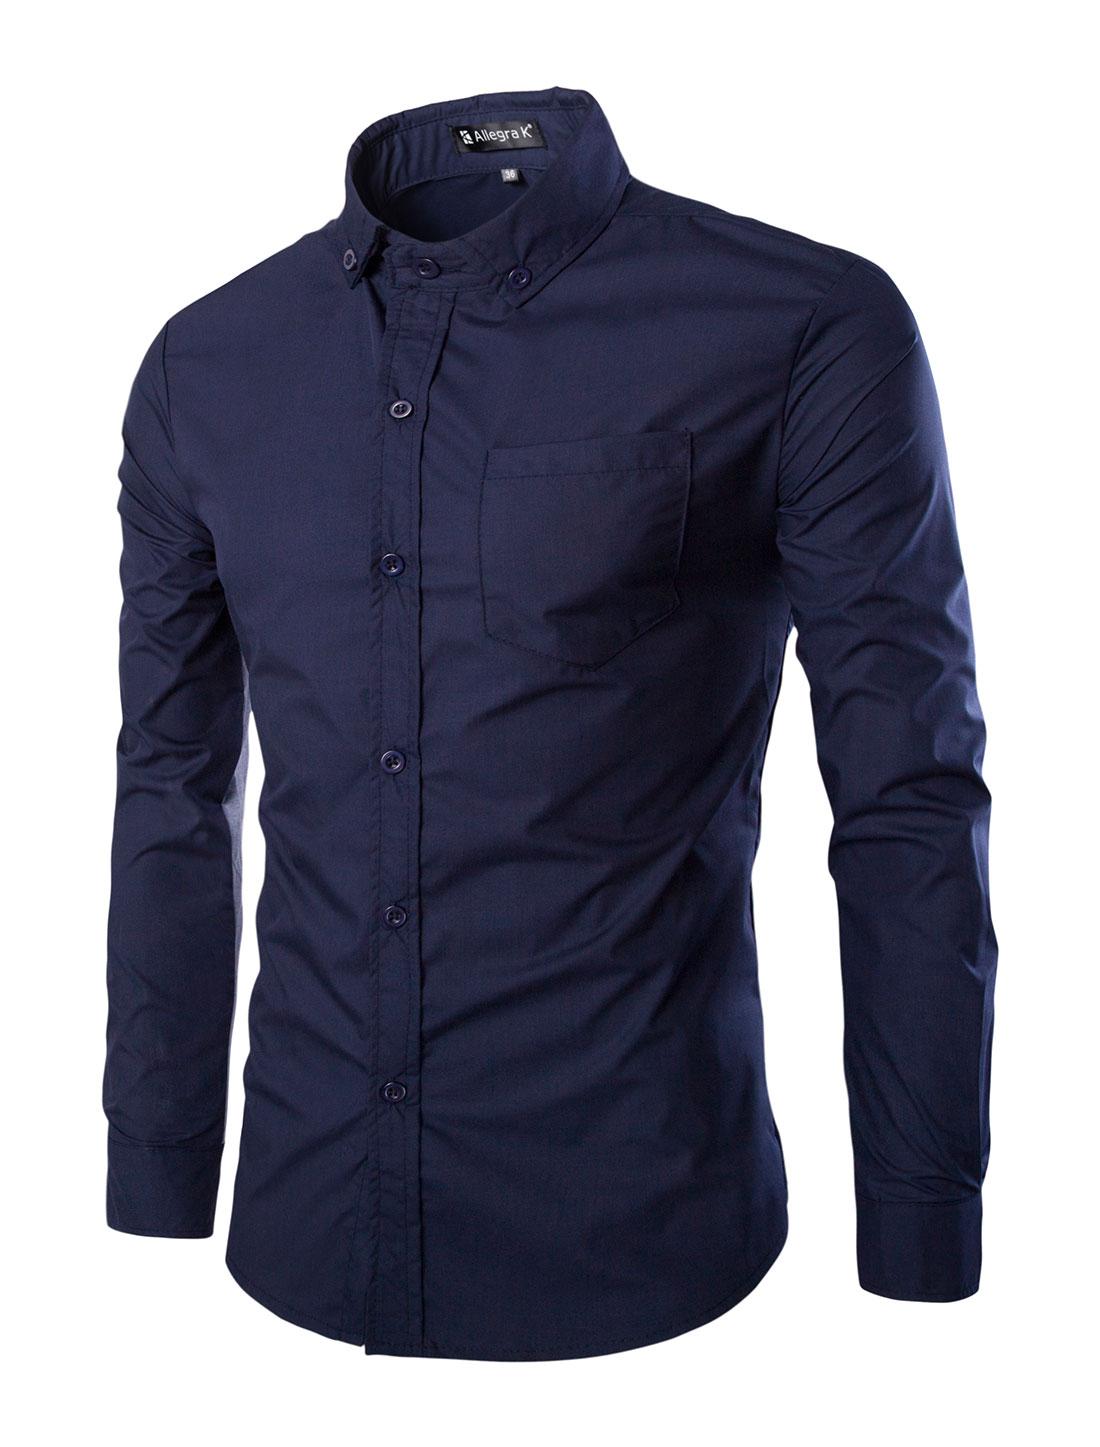 Men Contrast Color Long Sleeves Button Down Shirt w Pocket Blue M